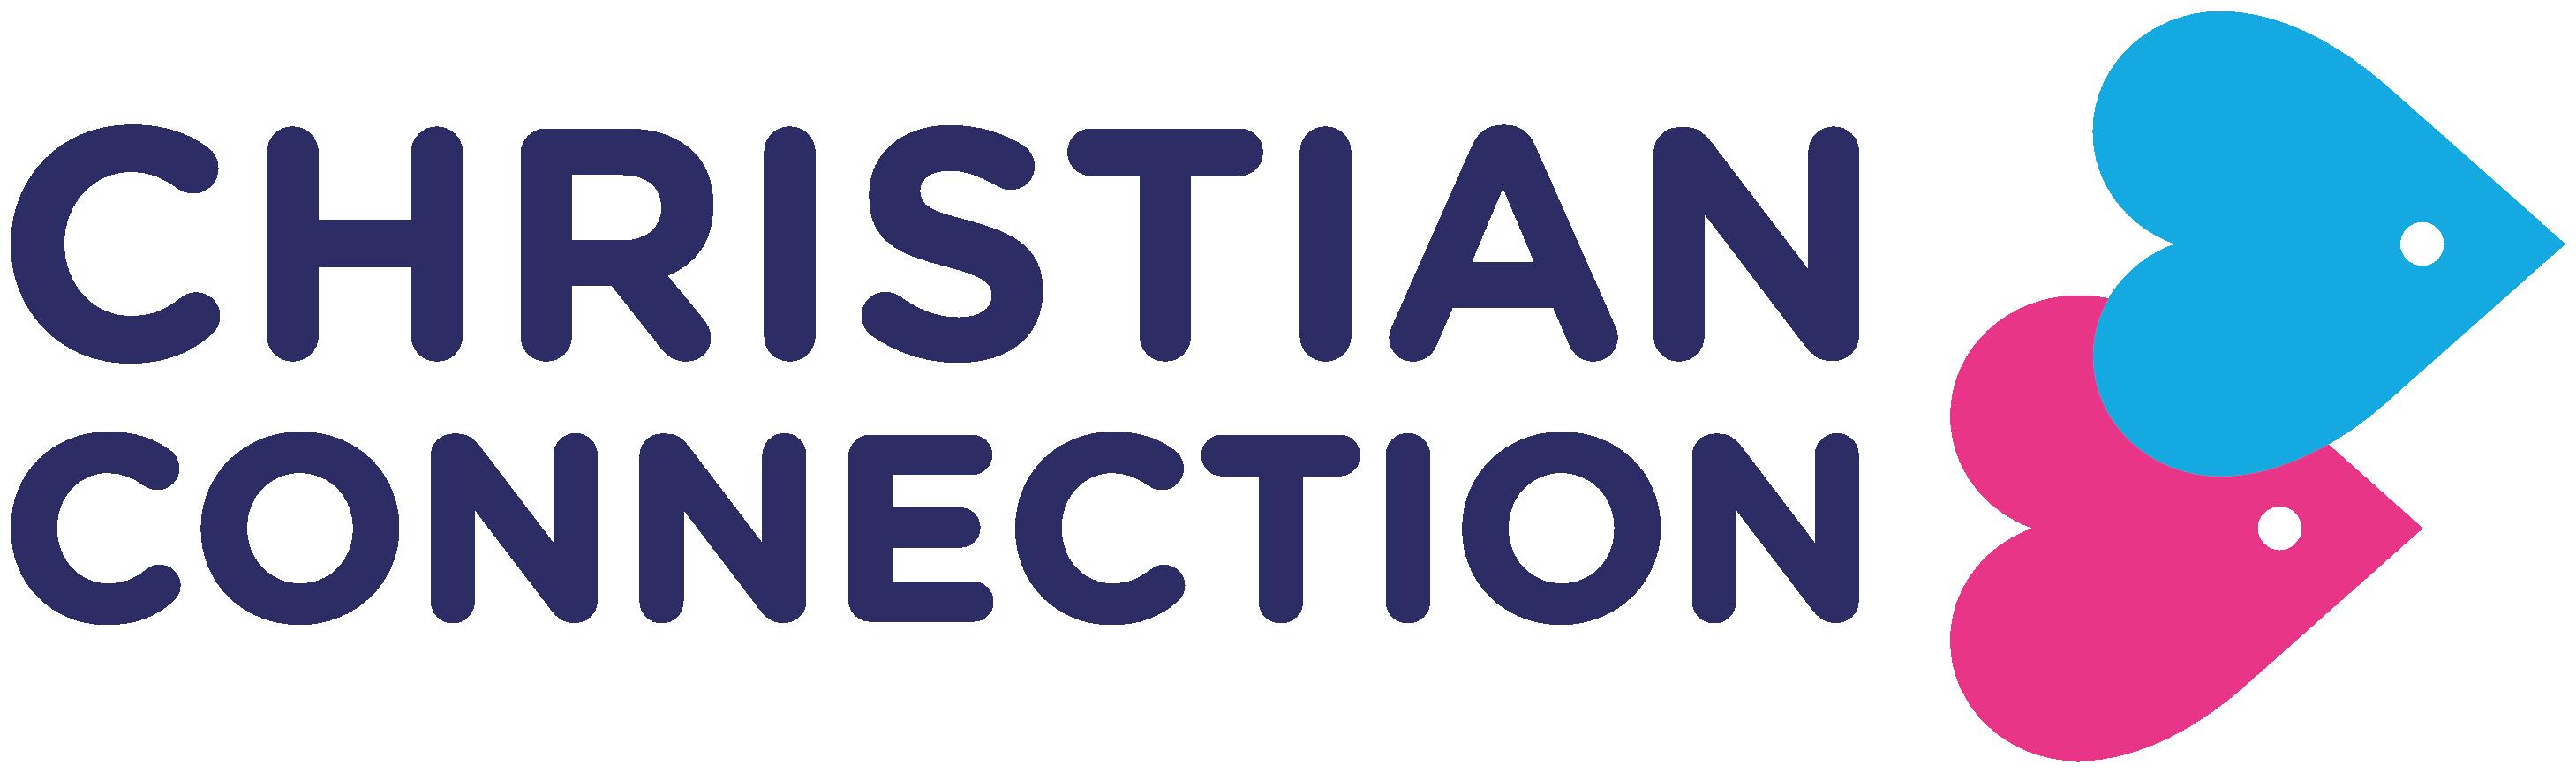 Christian Connection Logo